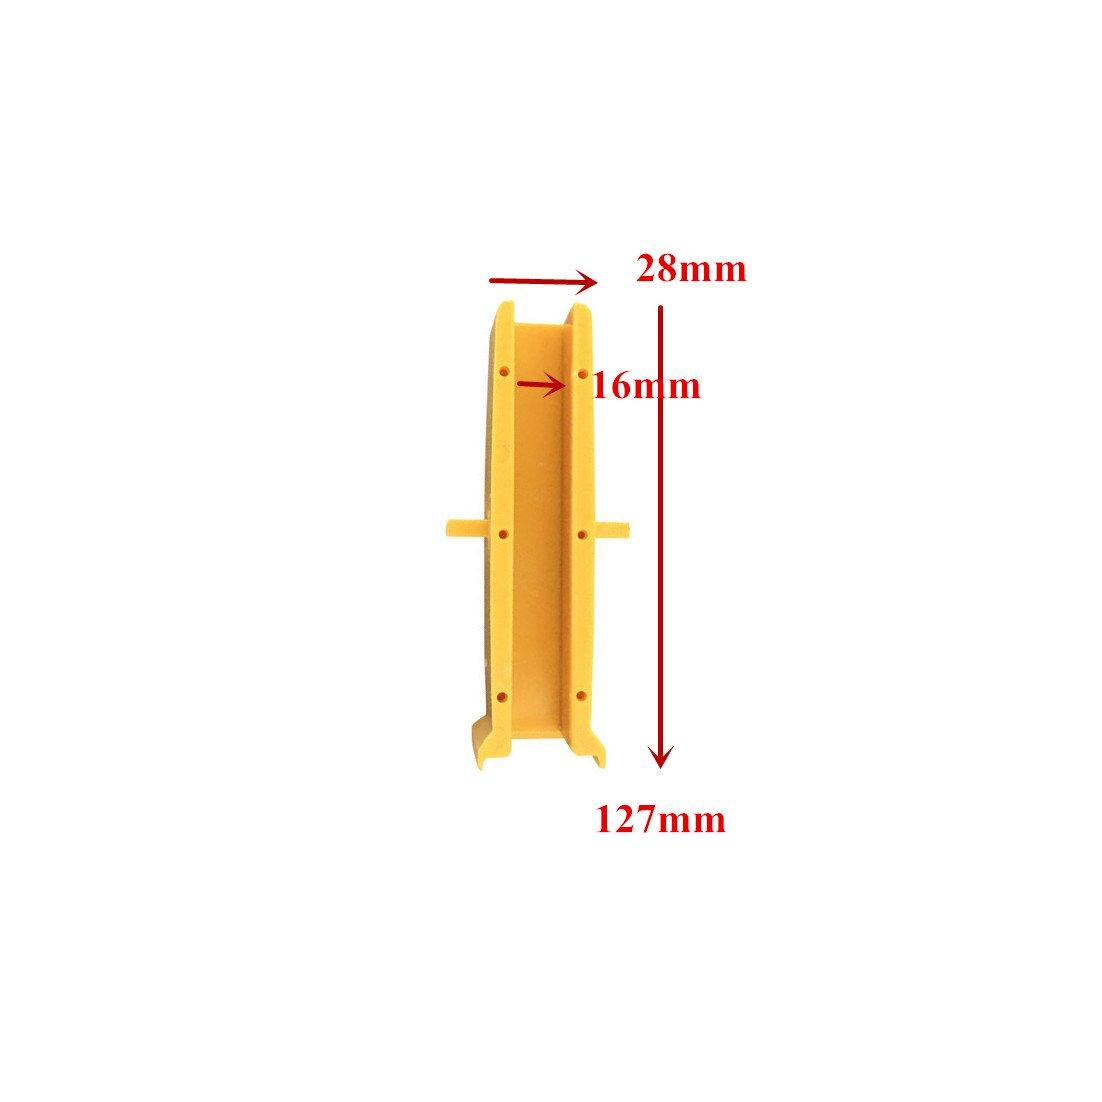 20pcs/ 1 Pack Elevator Guide Insert Length 127 Width 28mm Groove Width 16mm